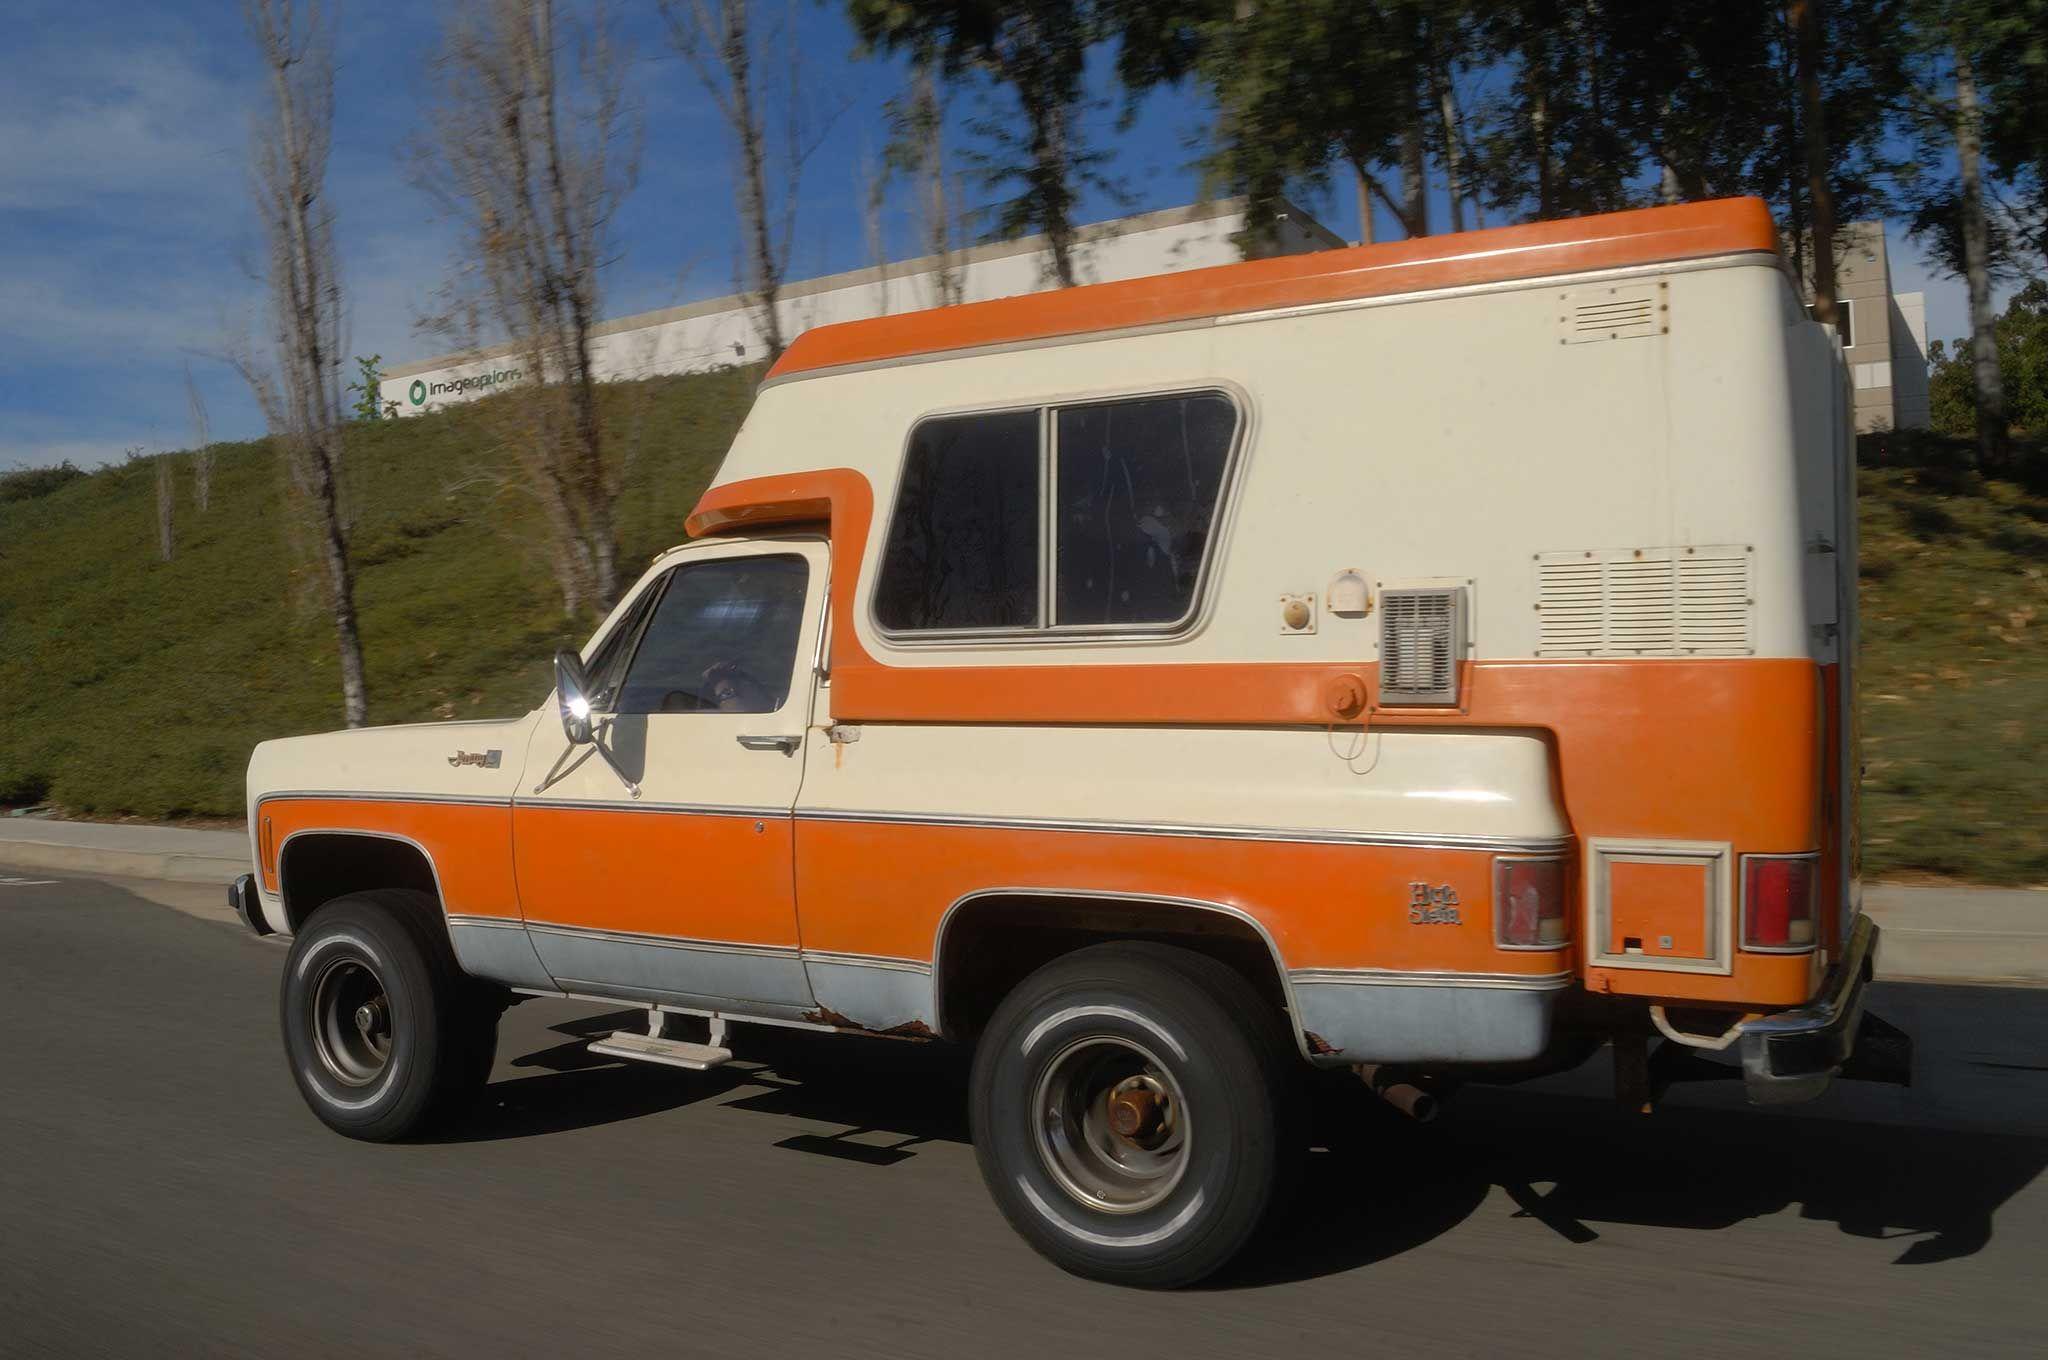 1976 Gmc Jimmy Casa Grande Gmc Sweet Ride Recreational Vehicles